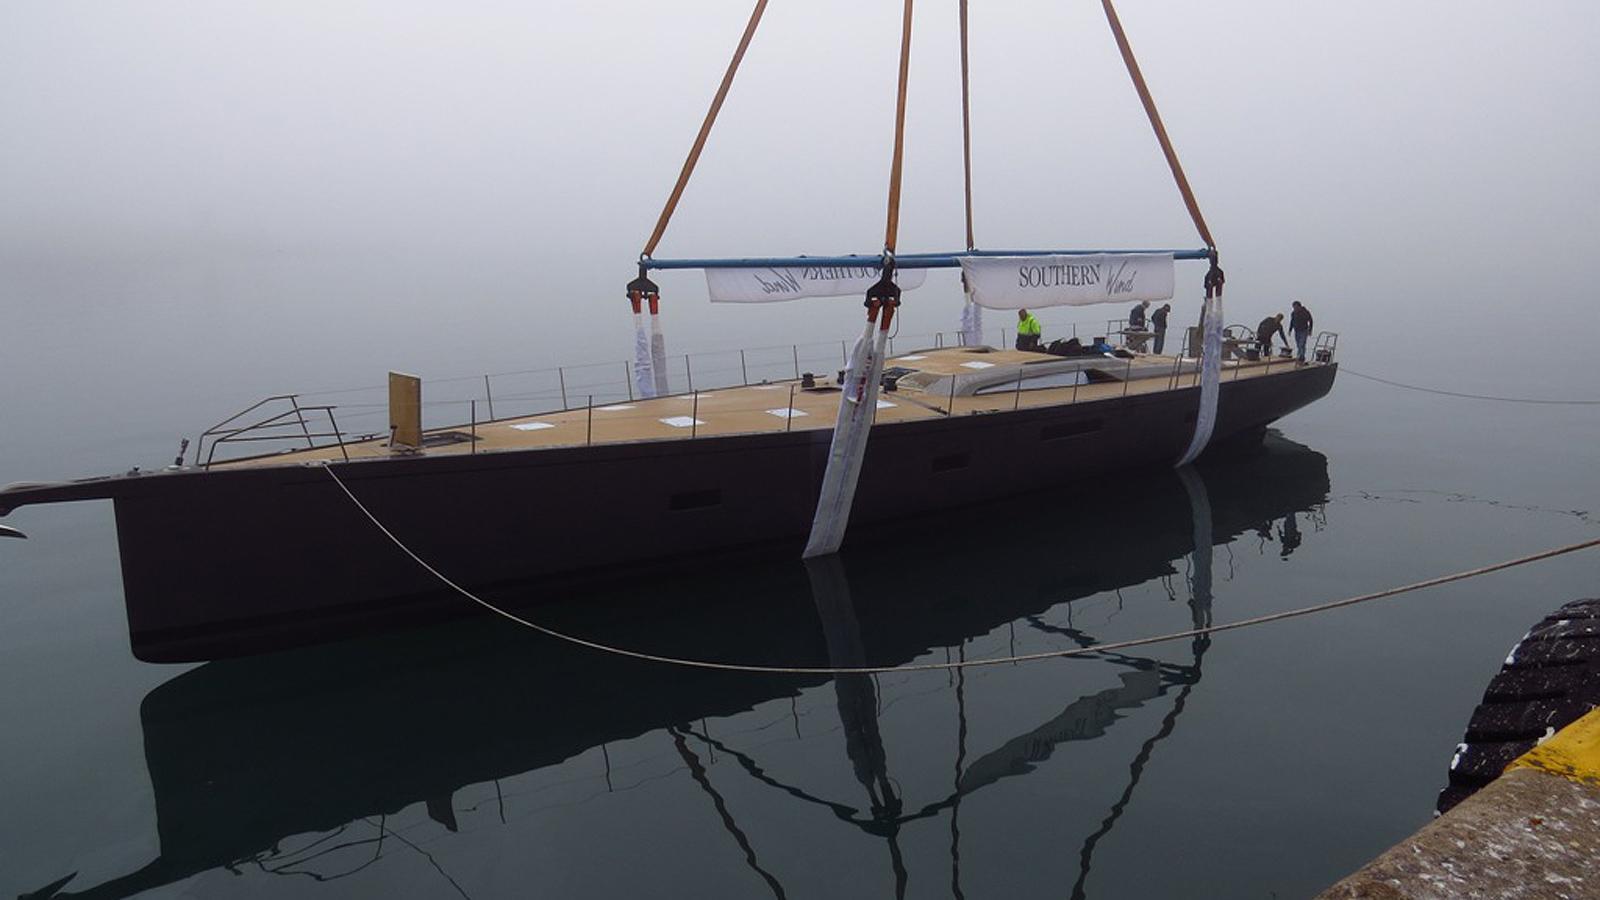 sorceress sailing yacht southern wind shipyard 96 29m 2017 launch